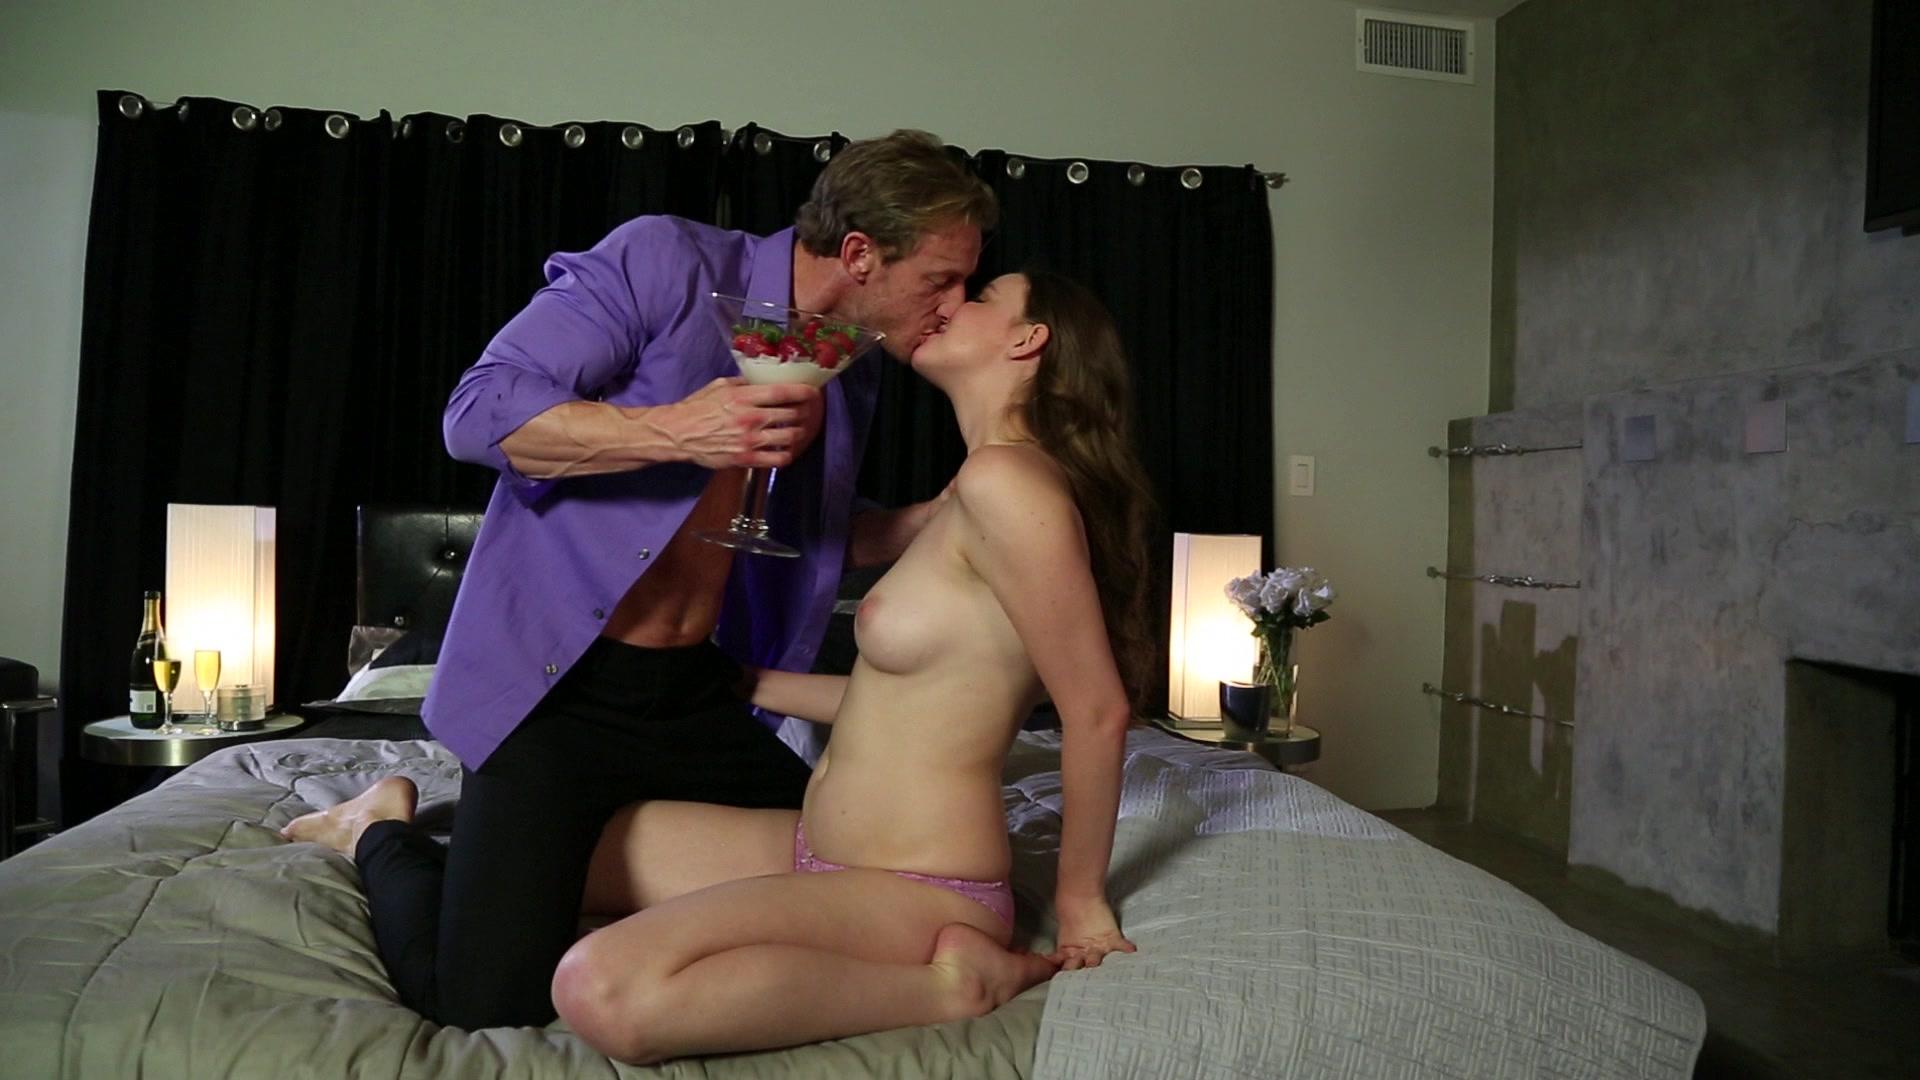 Sex advice with suzi godson